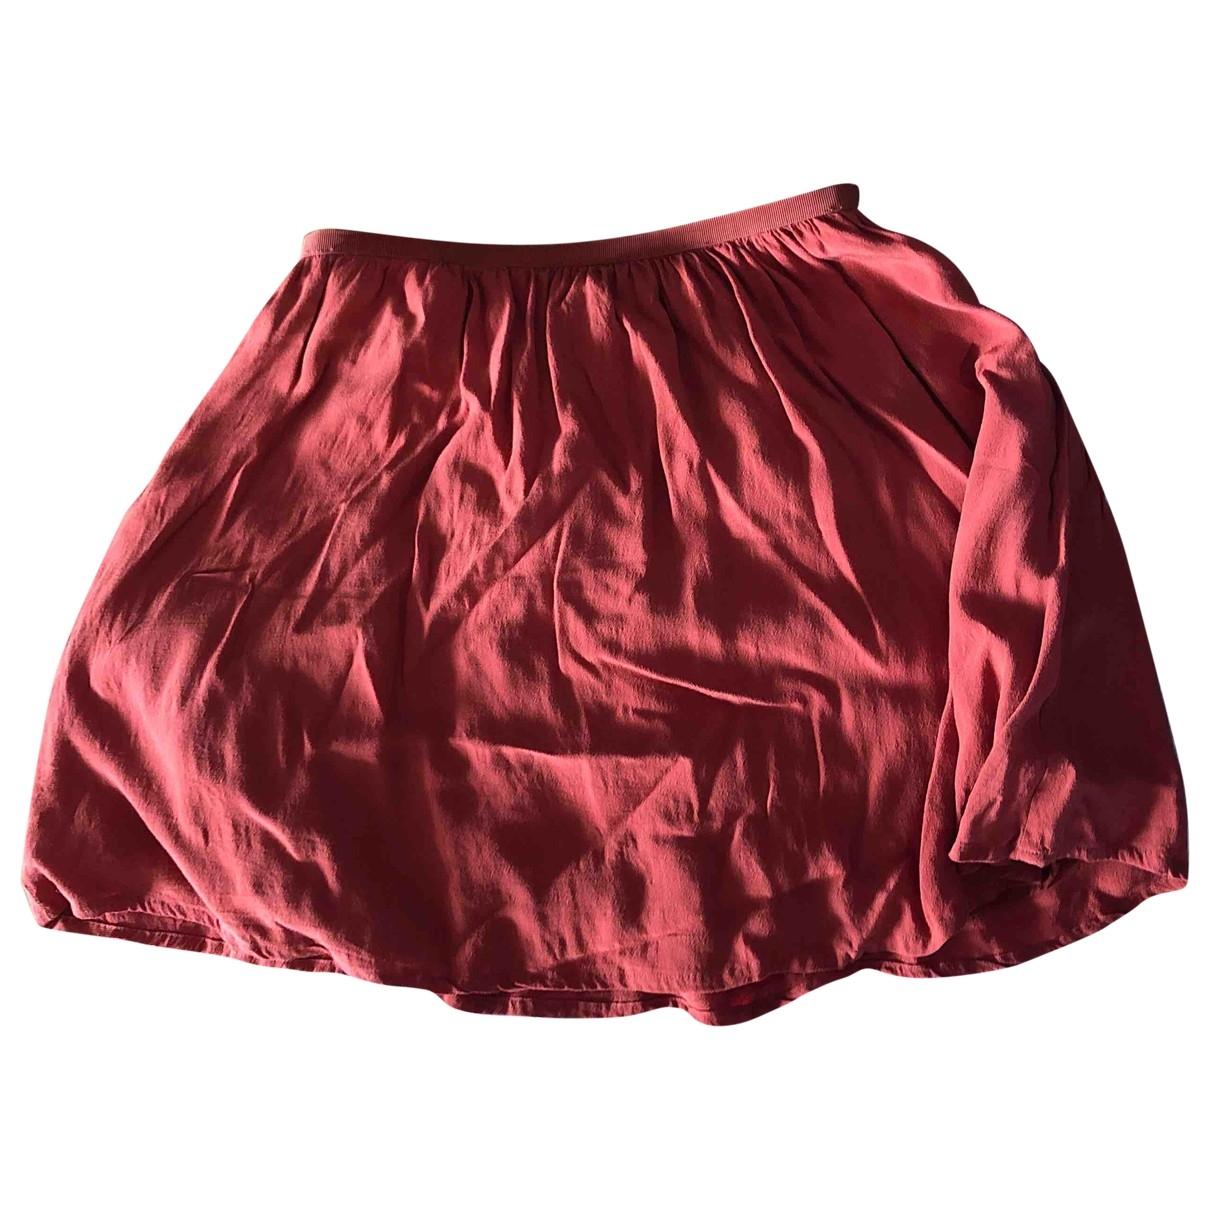 American Vintage \N Orange skirt for Women S International